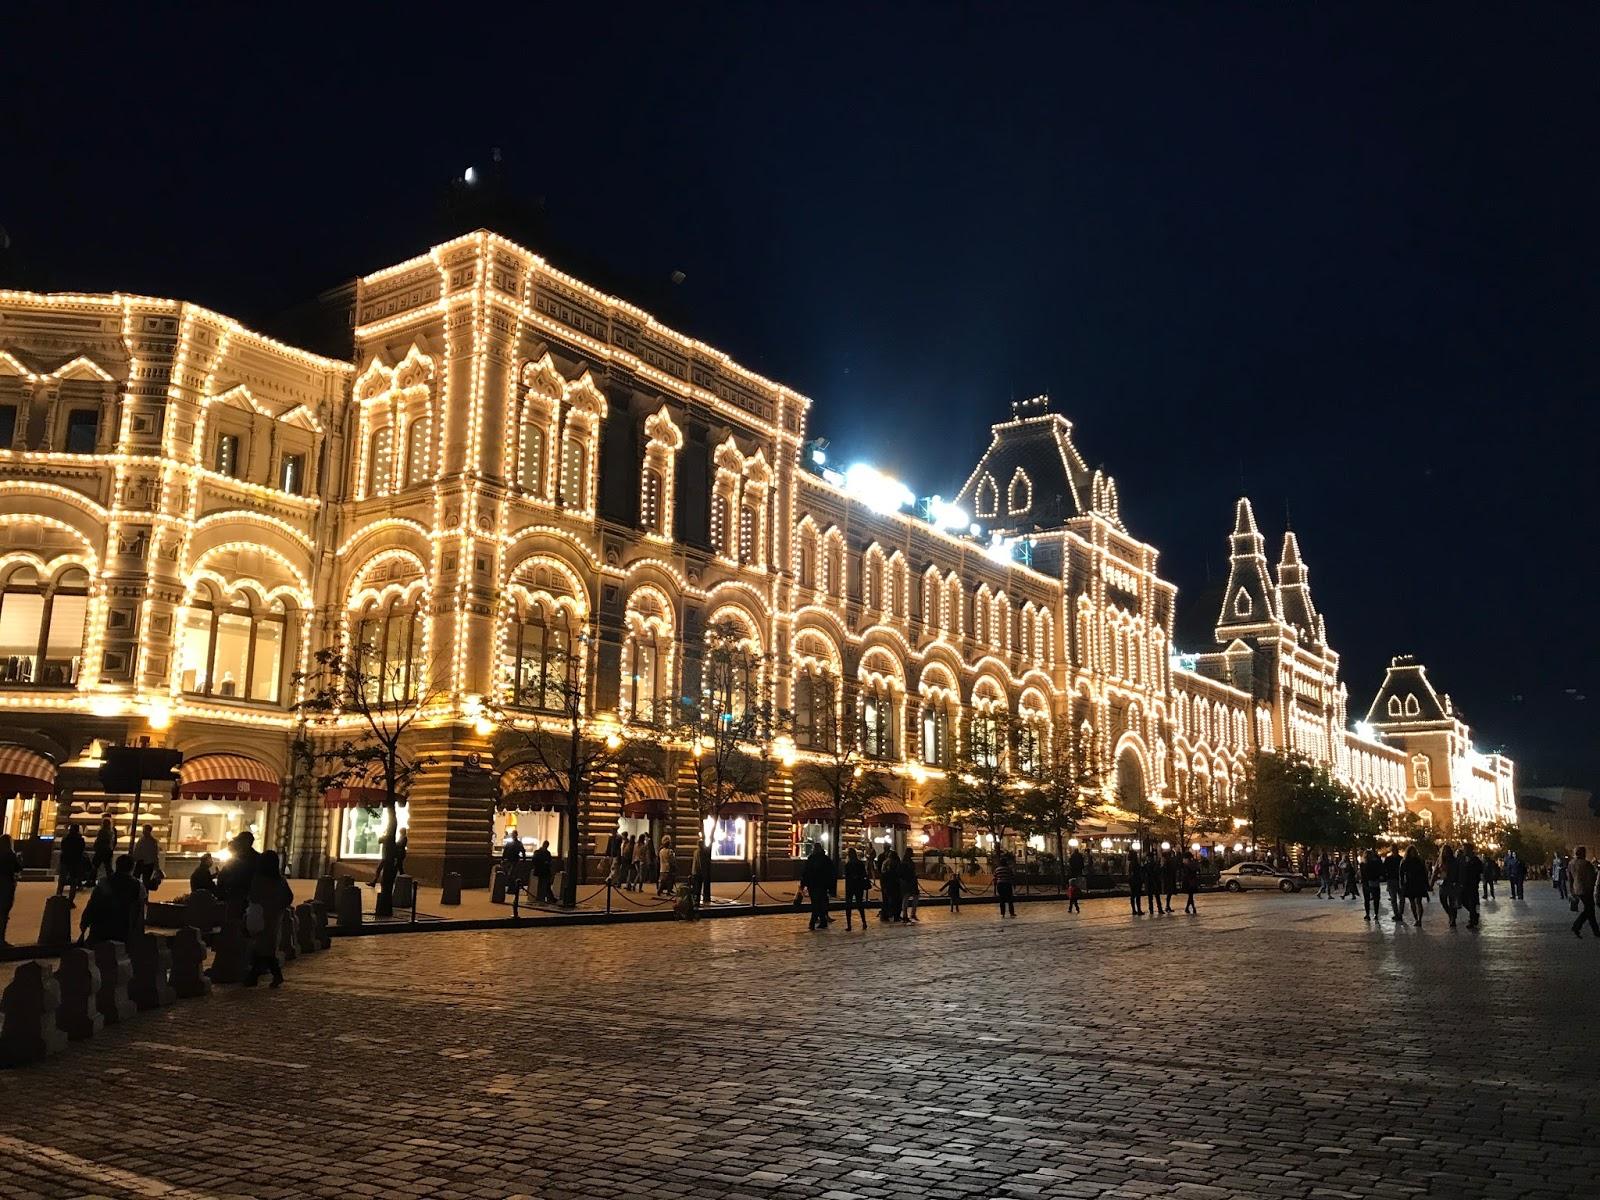 GUM à noite - Moscou